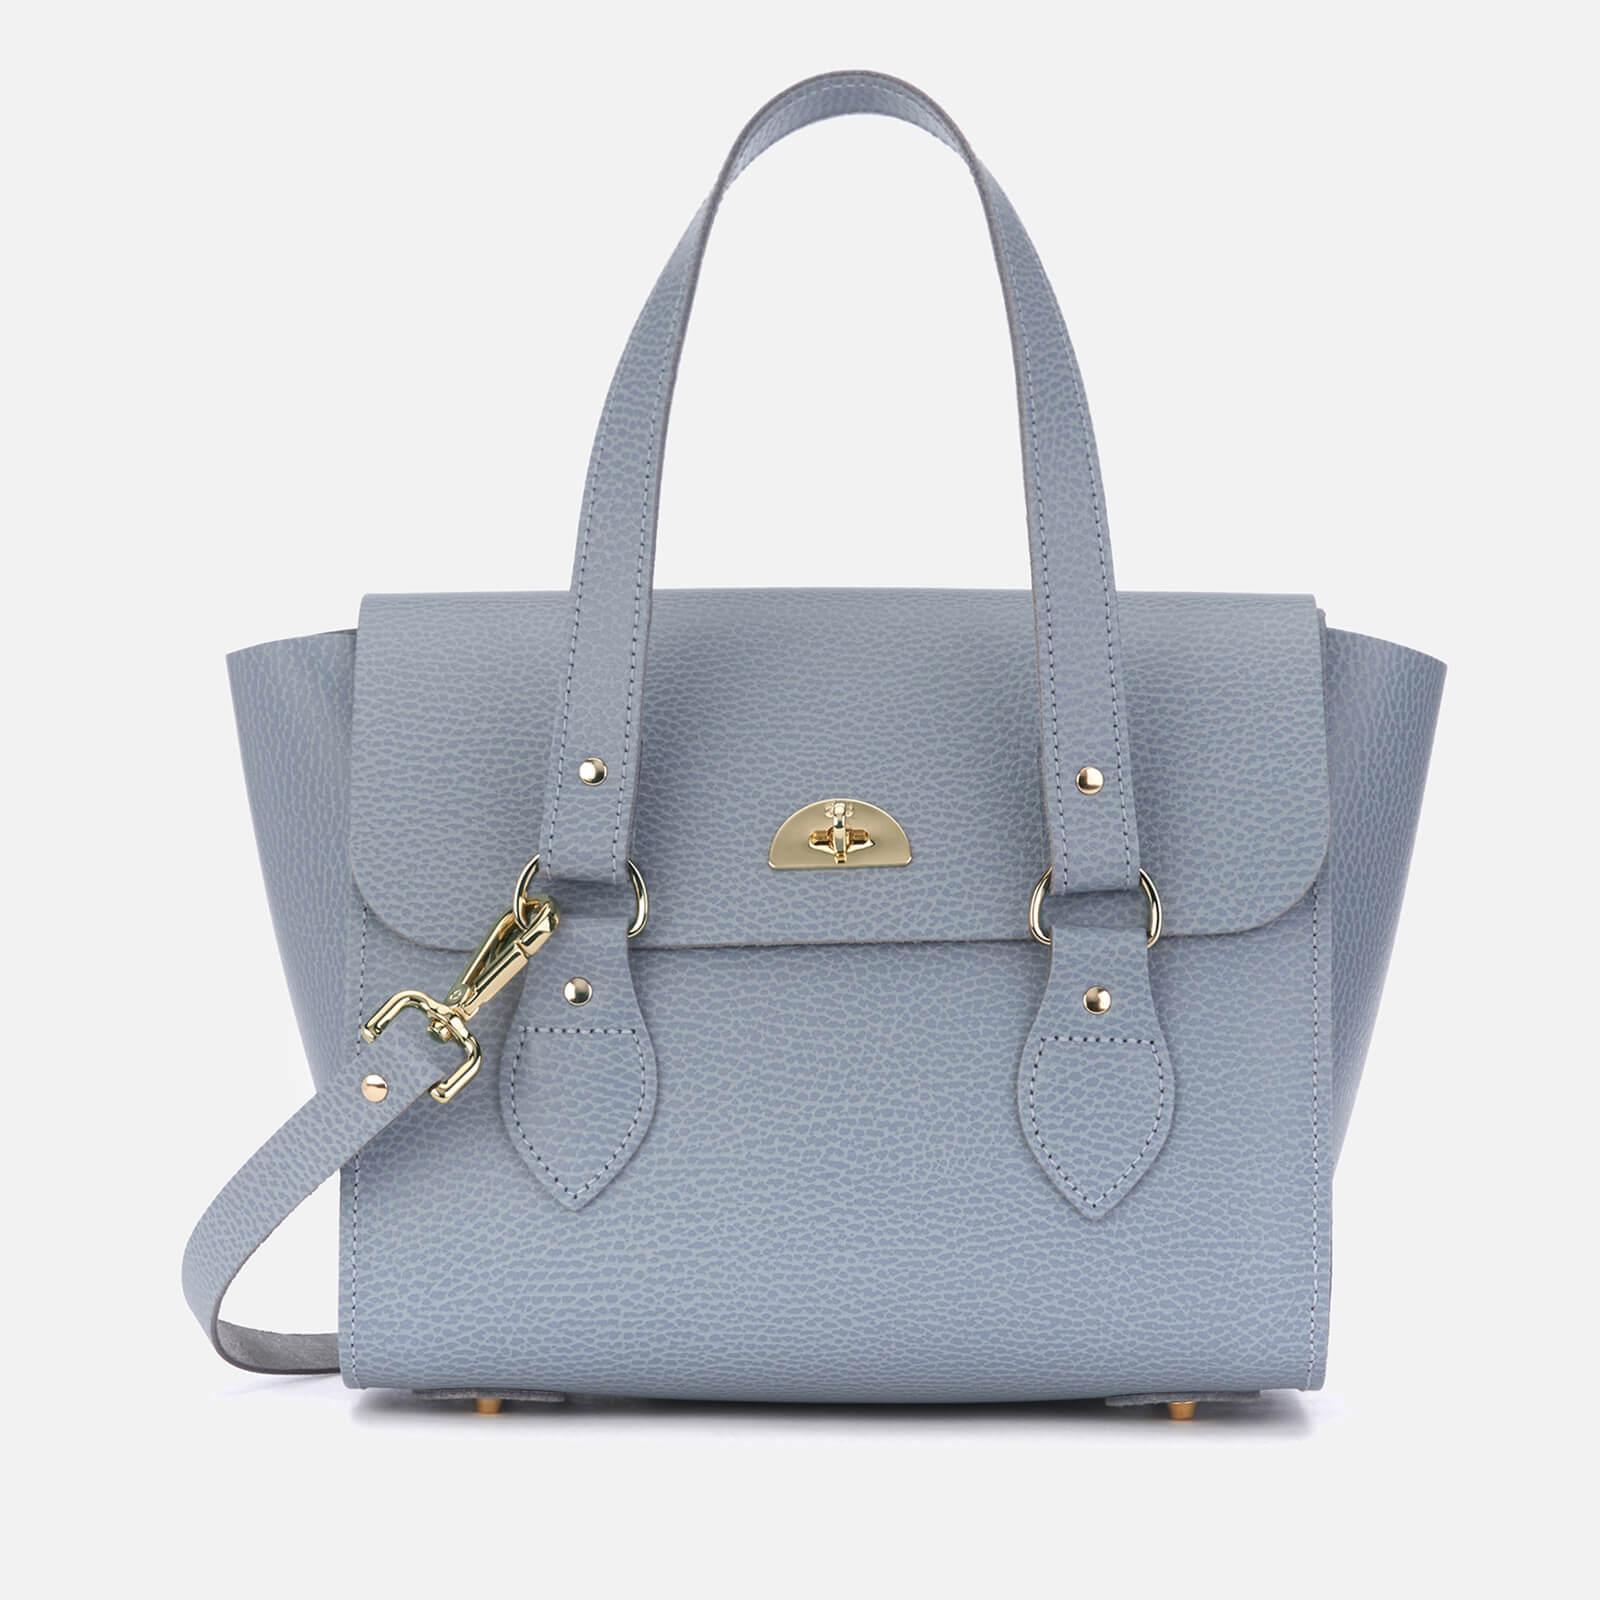 083bf99f9d9 The Cambridge Satchel Company Women's Small Emily Tote Bag ...